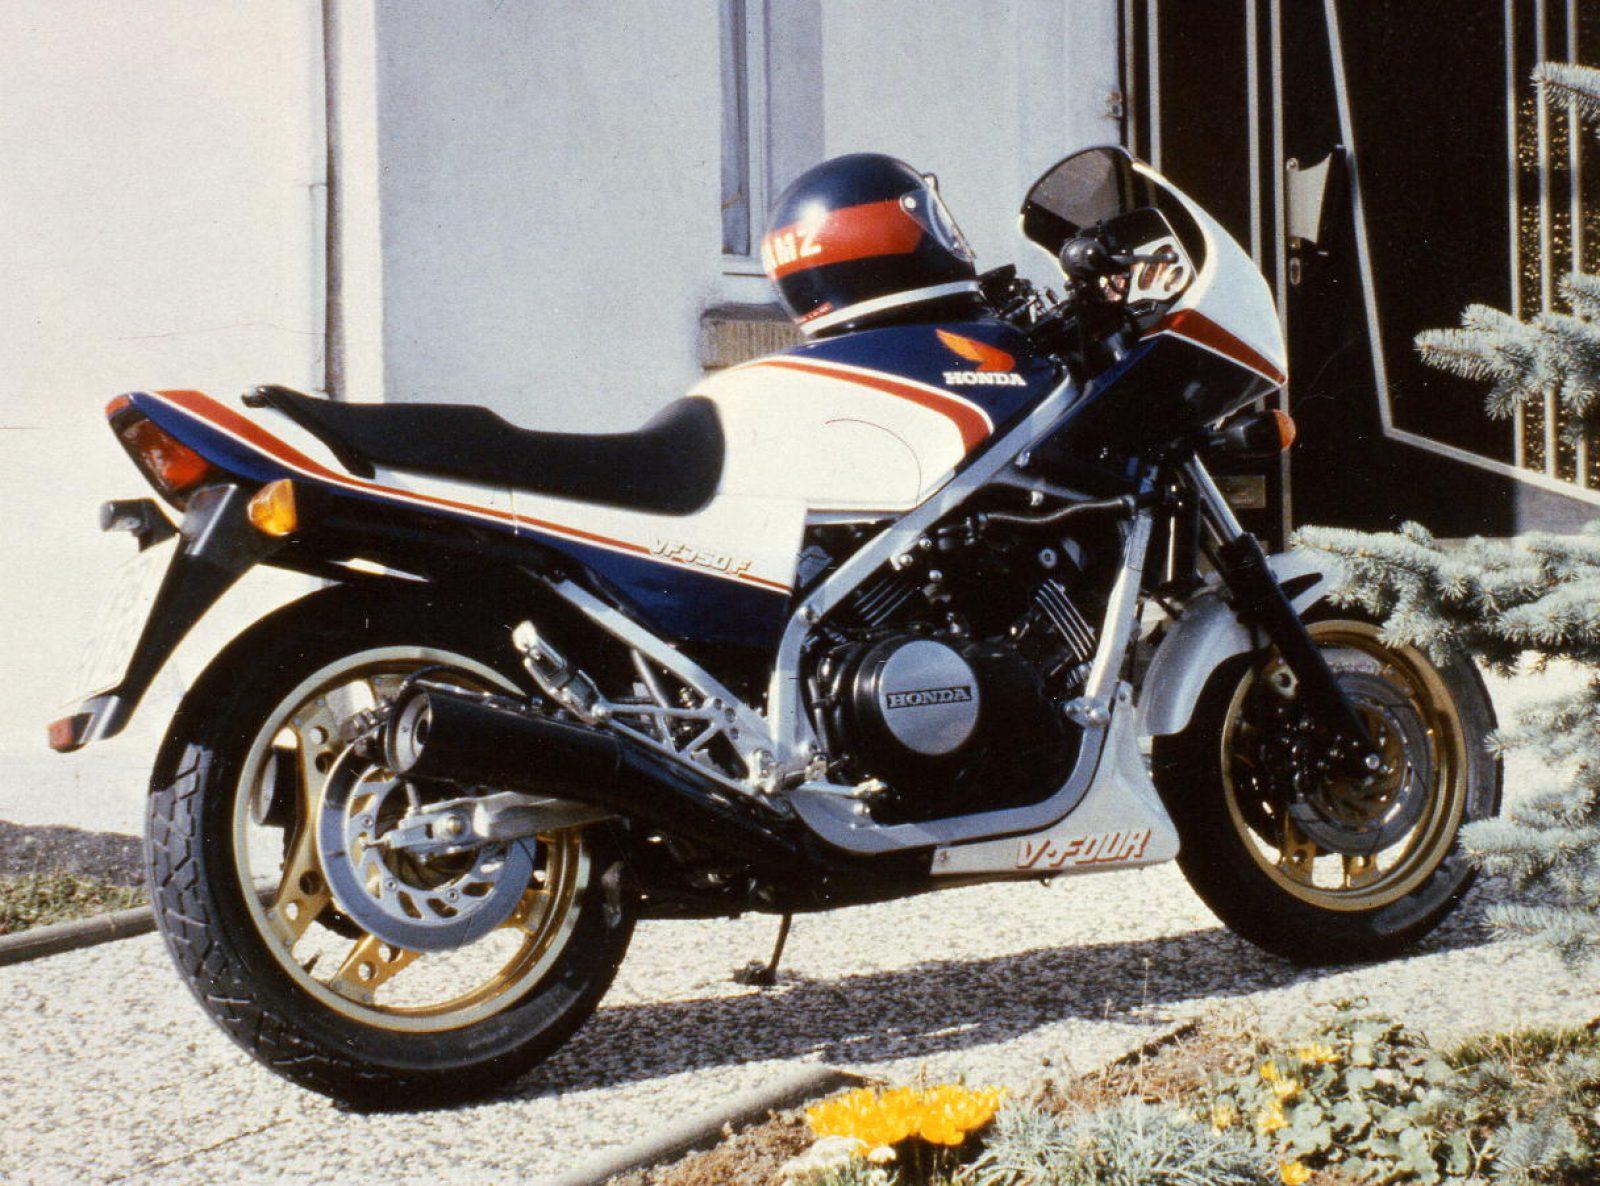 1983 Honda VF750F a